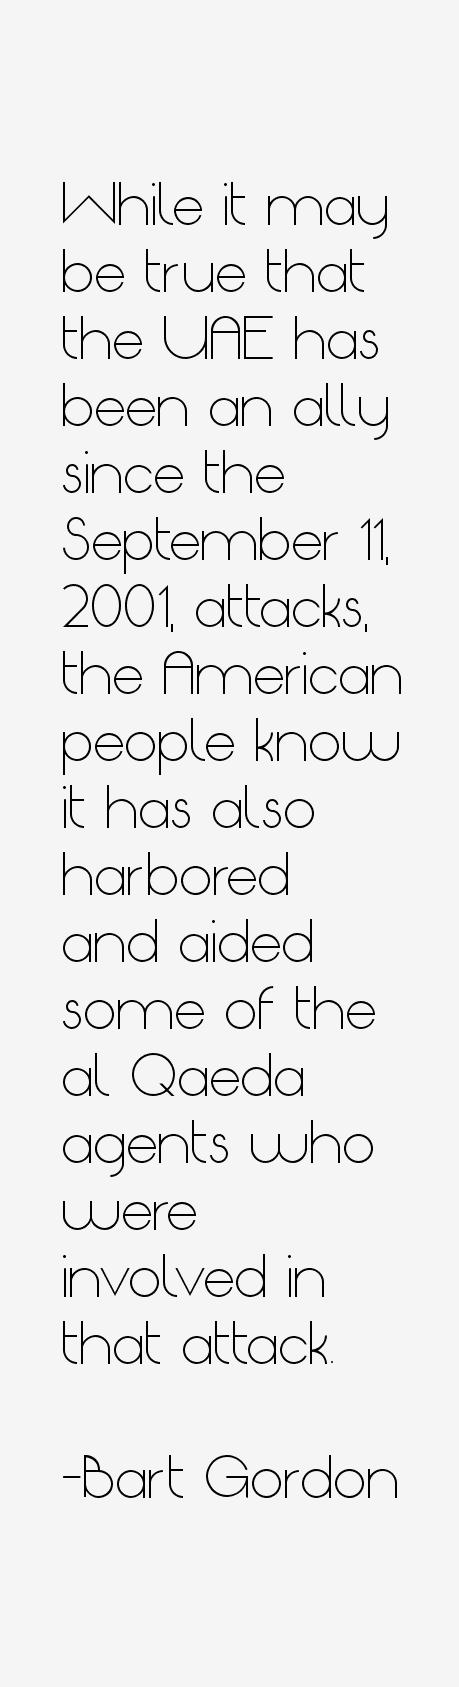 Bart Gordon Quotes